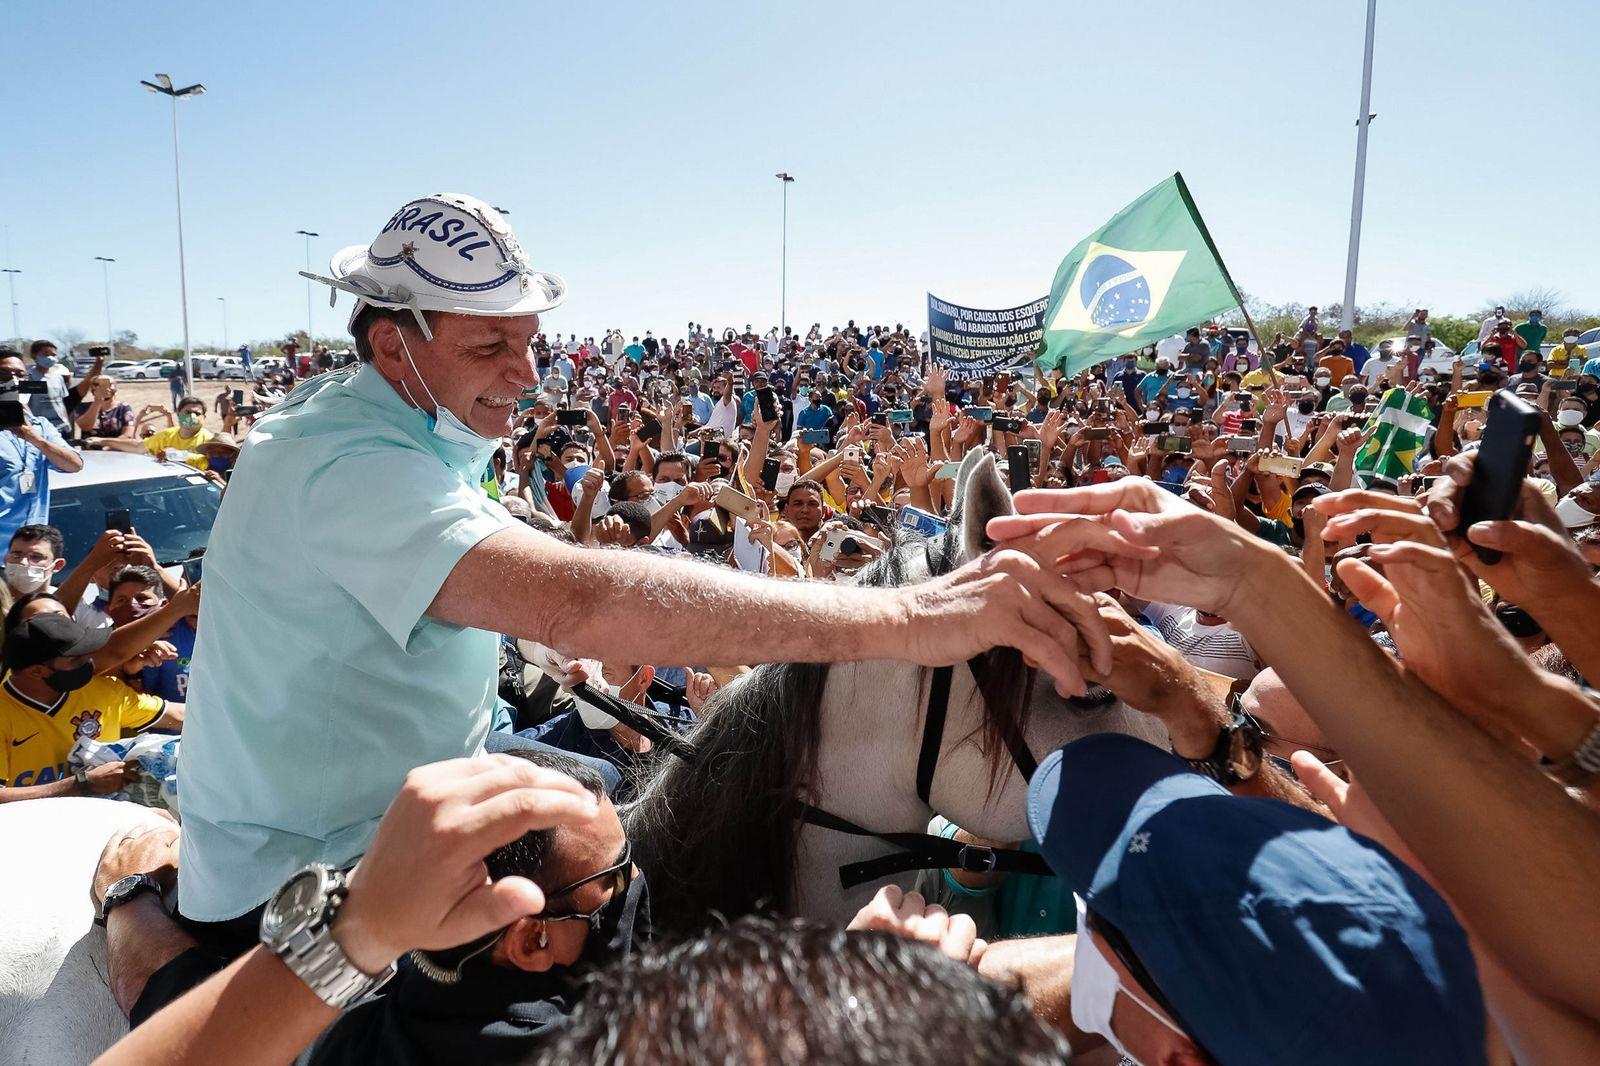 Visit of the President of Brazil to the interior of the country, Sao Raimundo Nonato - 30 Jul 2020